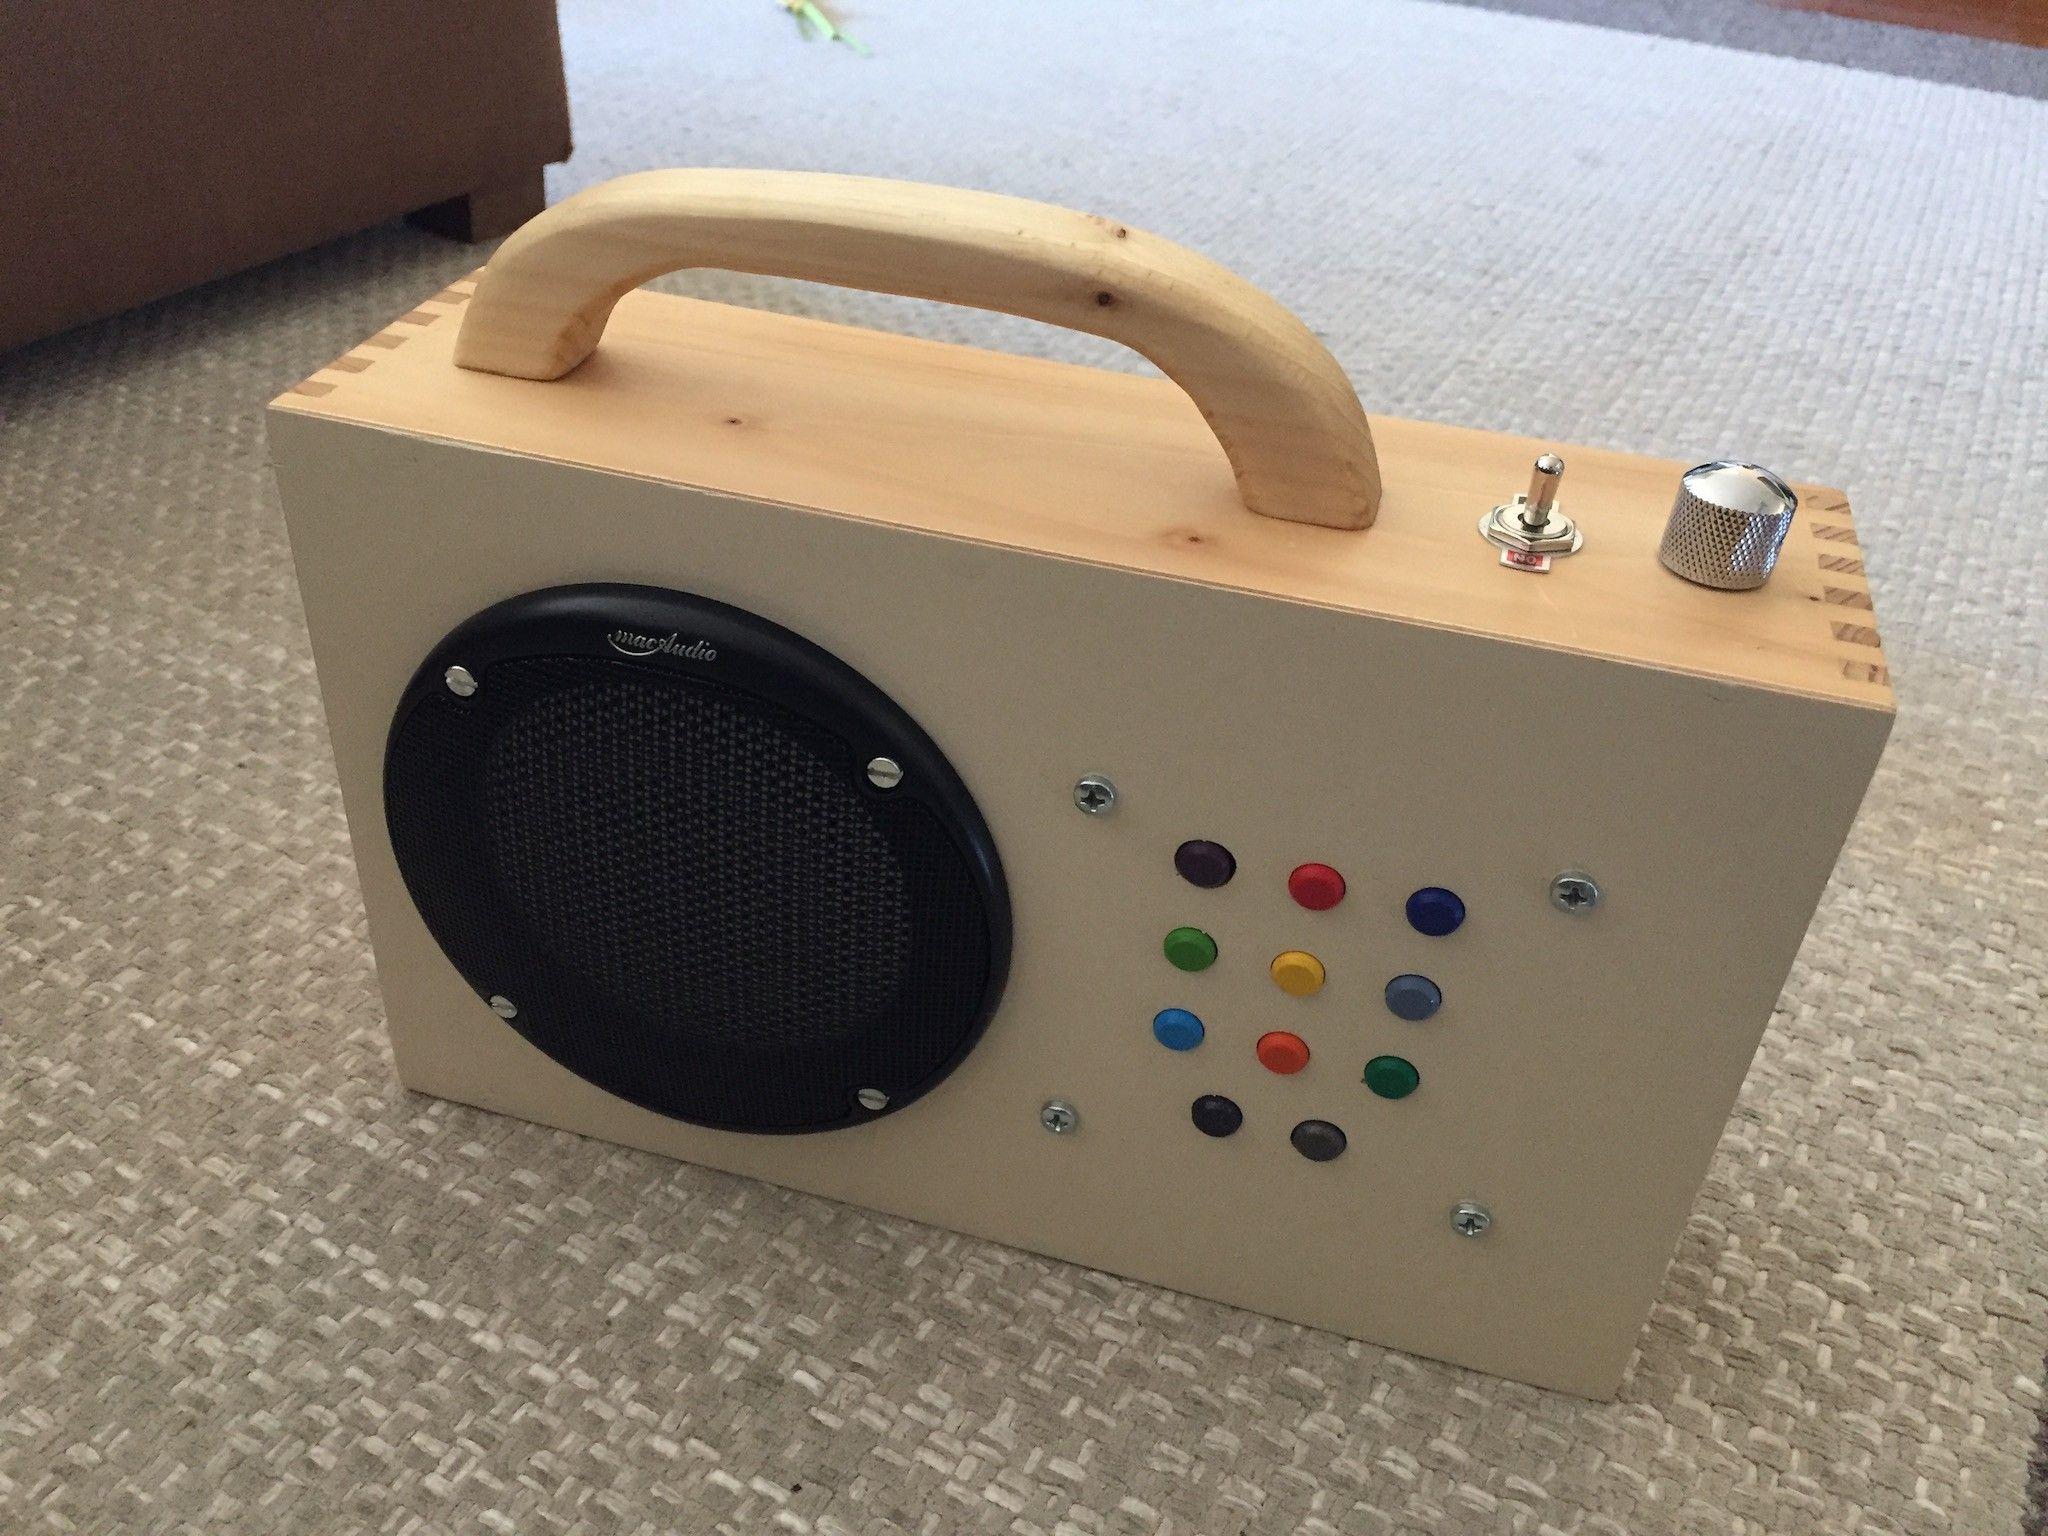 tr selber bauen good free affordable bausatz projekte basteln musikbox with musikbox bauen with. Black Bedroom Furniture Sets. Home Design Ideas